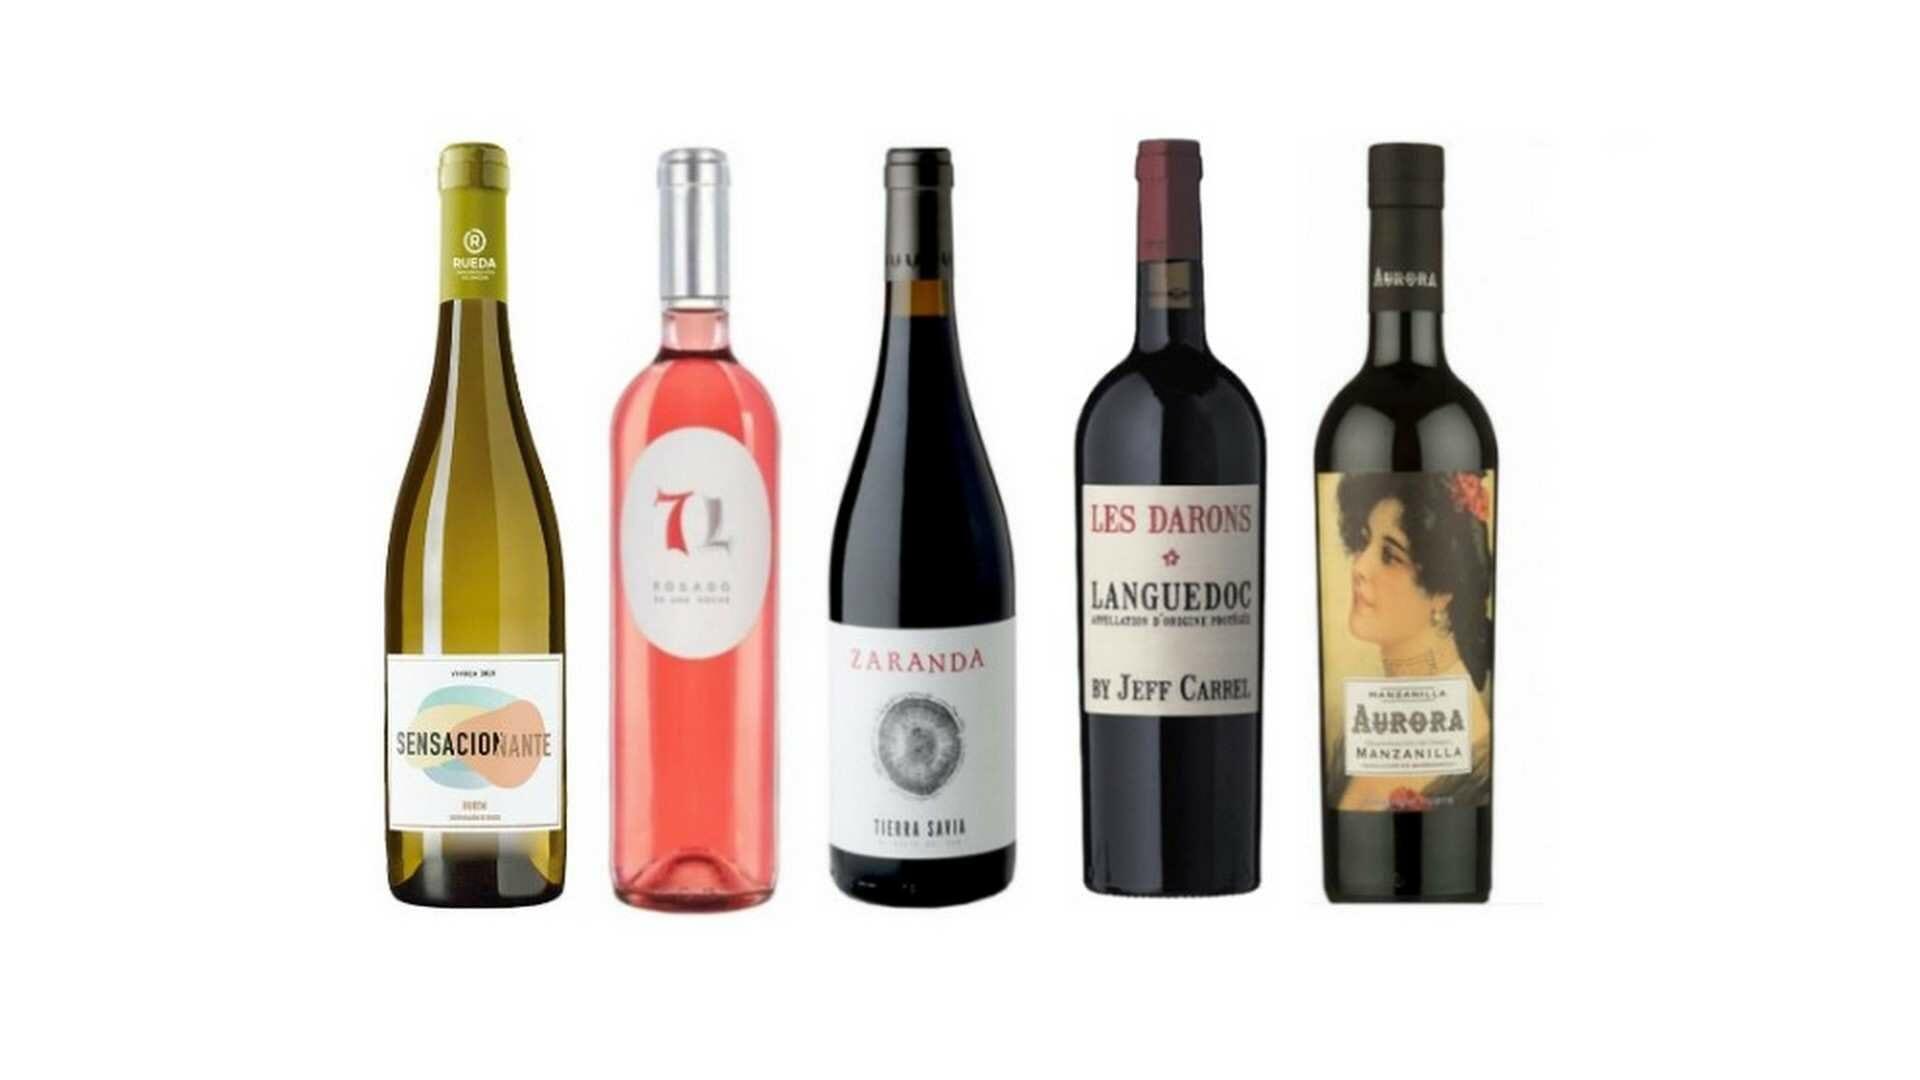 5 excelentes vinos por menos de 10€ para triunfar estas navidades